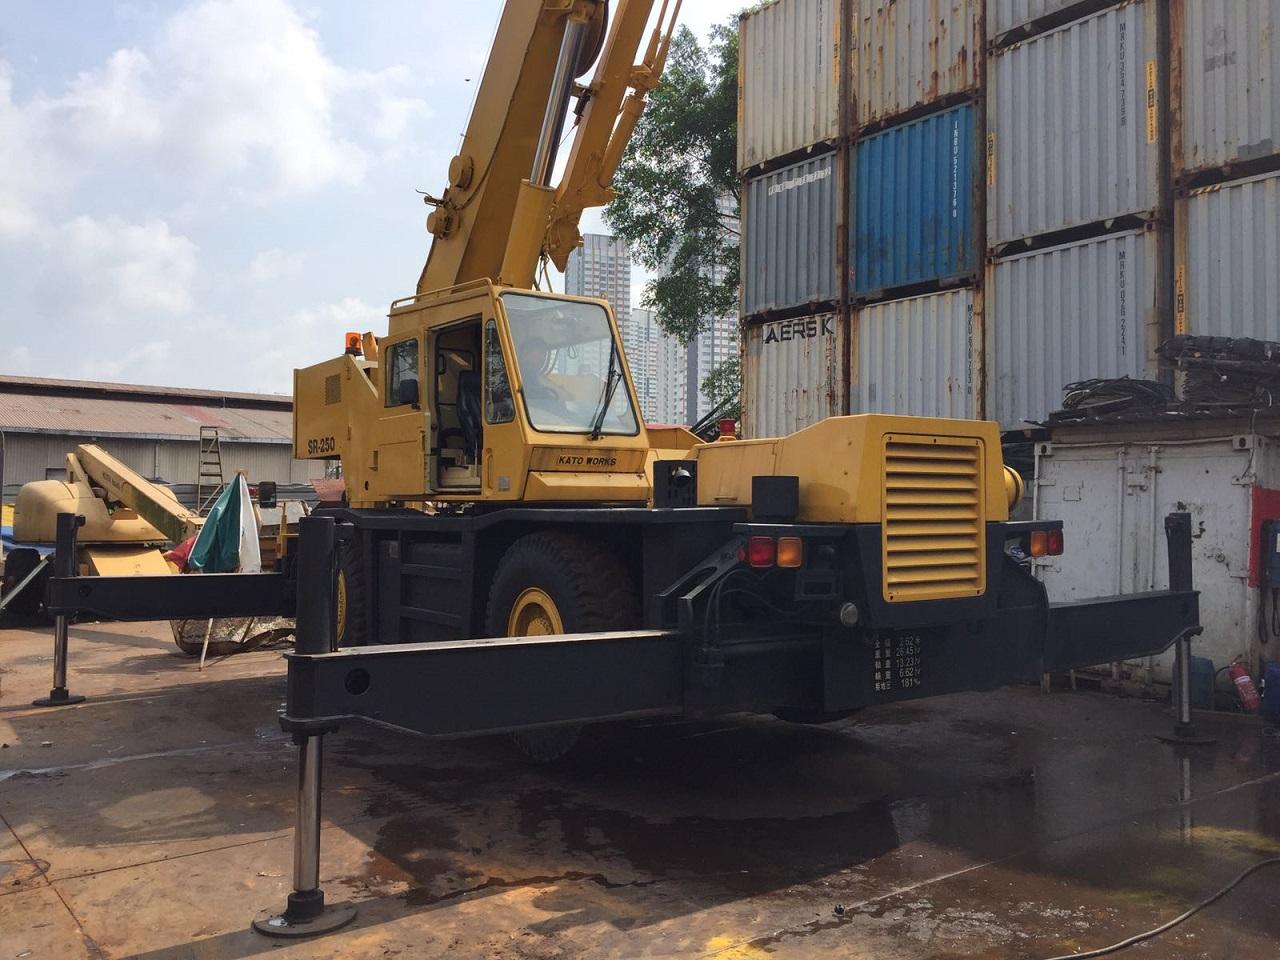 Rough Terrain Crane Rental Singapore : Kian hua hardware pte ltd product list